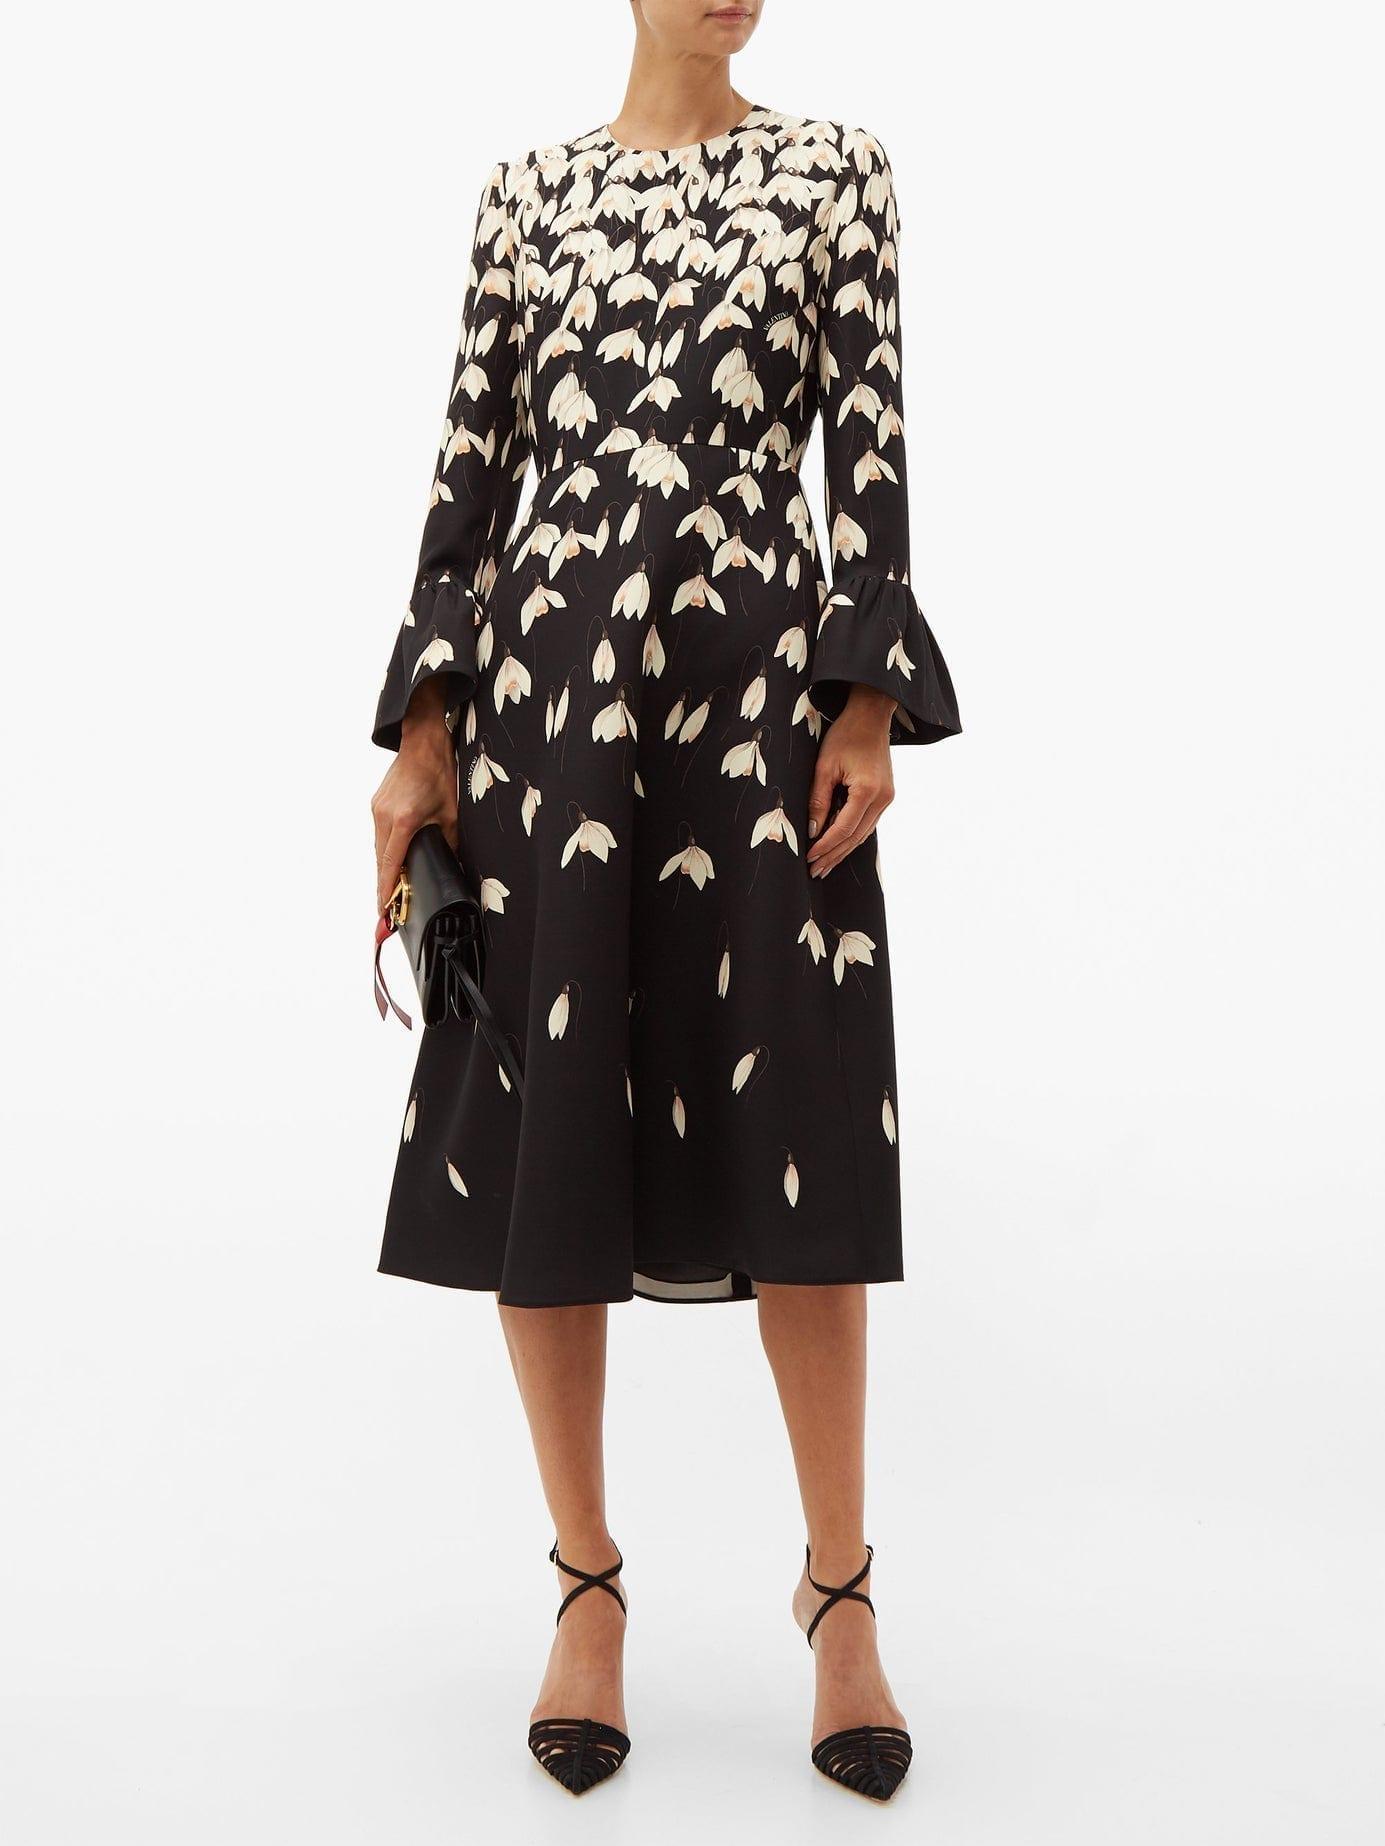 VALENTINO Snowdrop-Print Wool-Blend Crepe Midi Black Dress